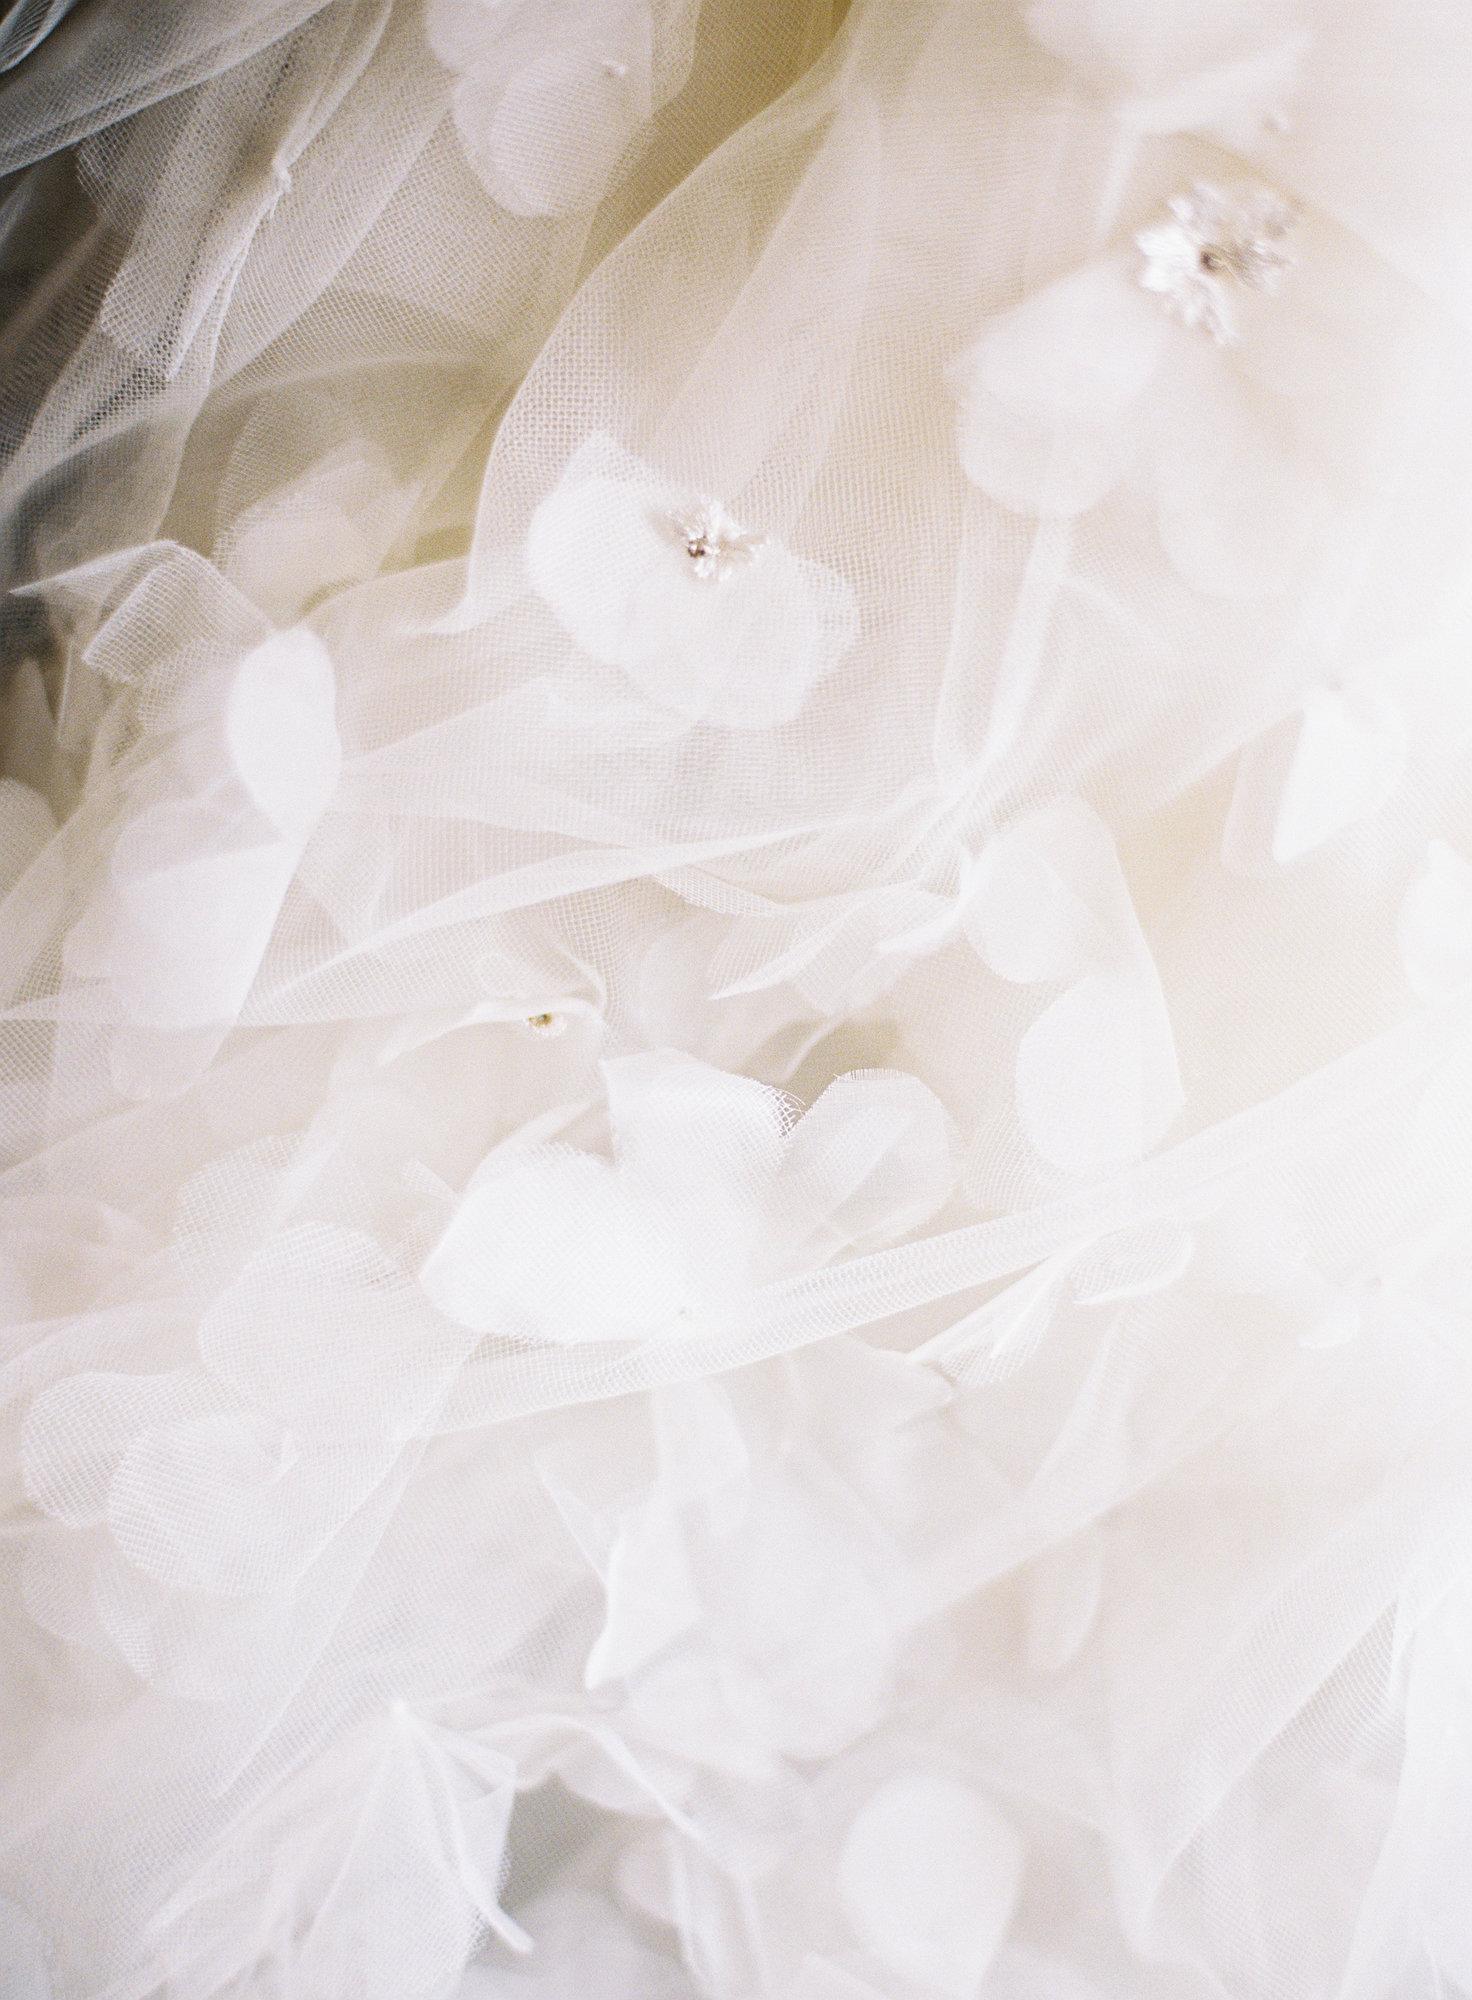 Bonnie Sen Photography-wedding-2-4